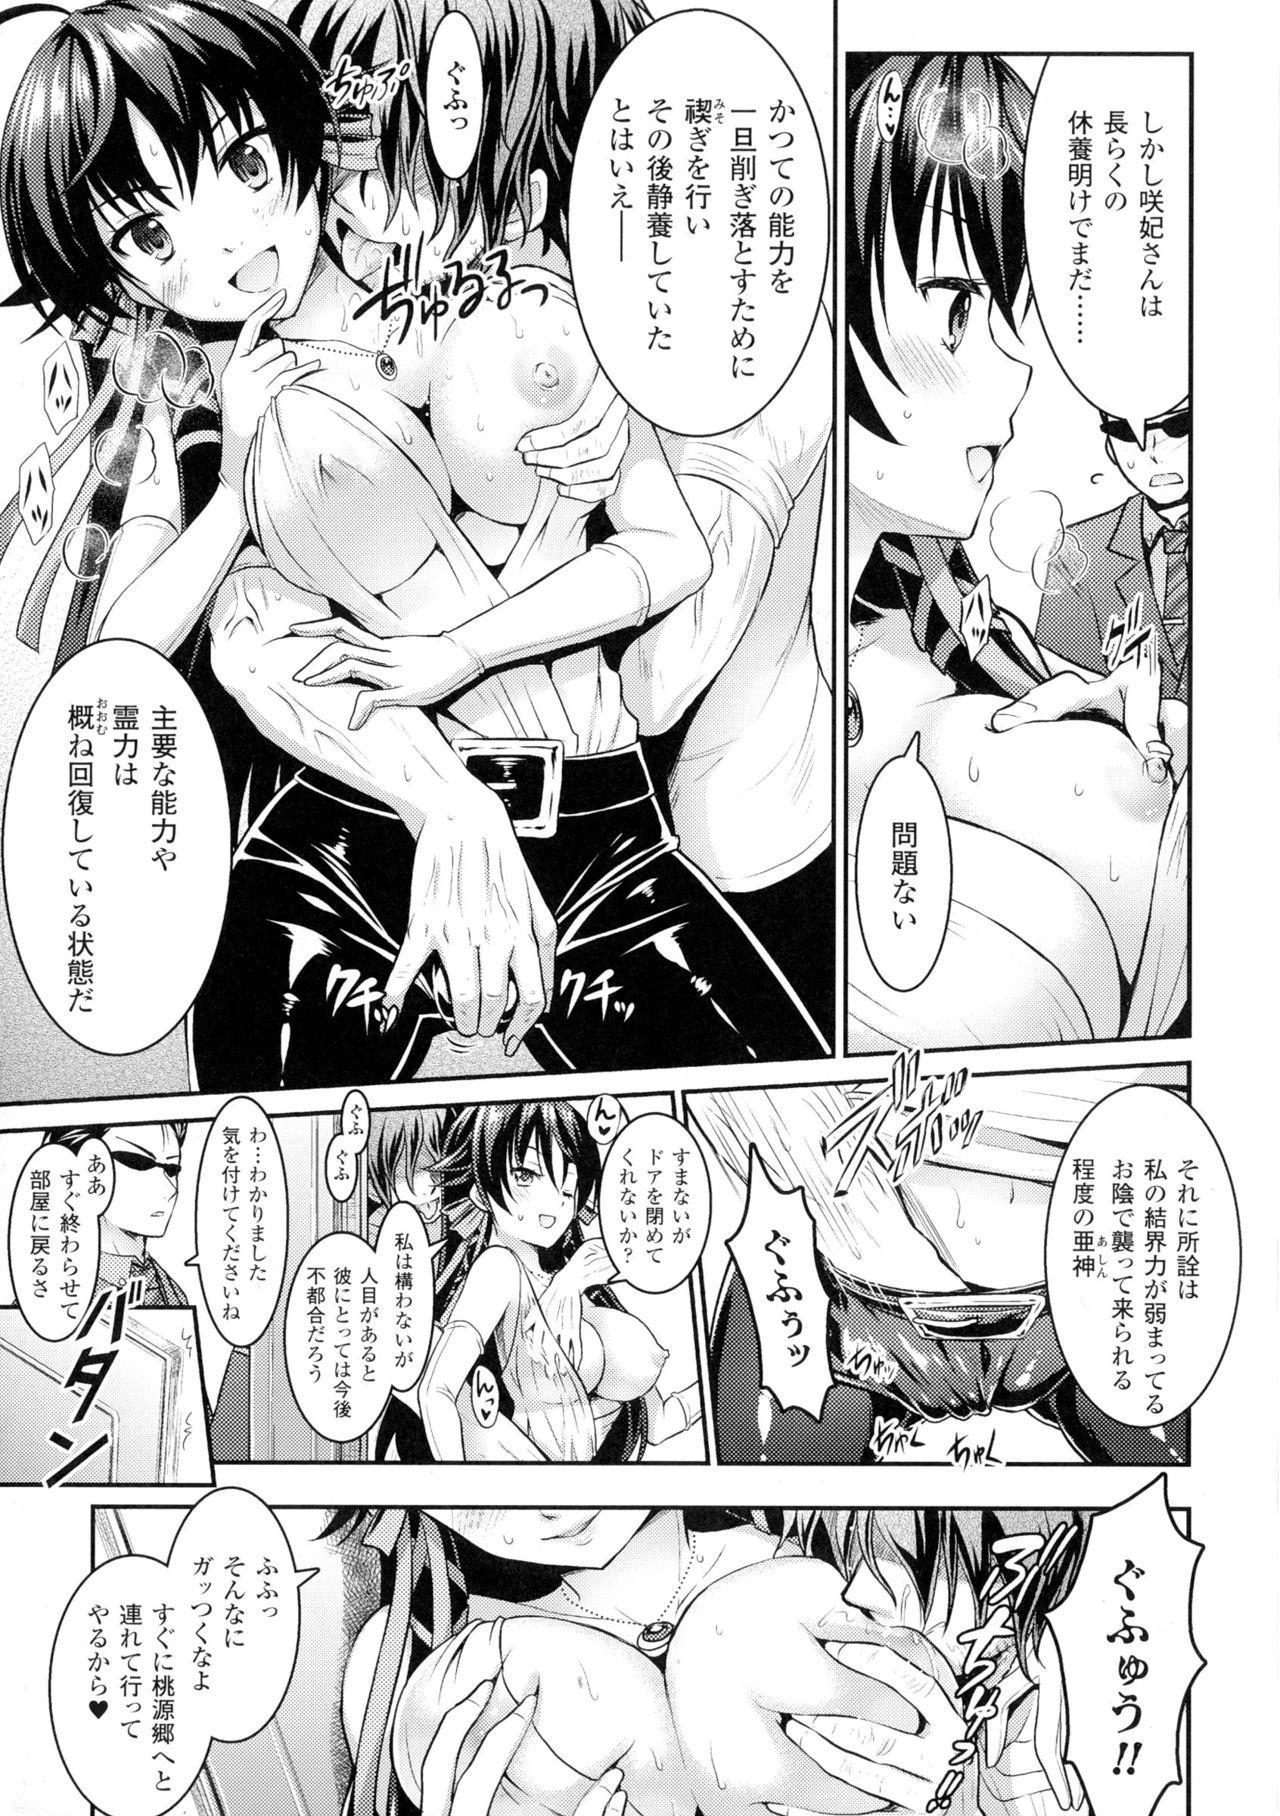 Seigi no Heroine Kangoku File DX Vol. 1 9